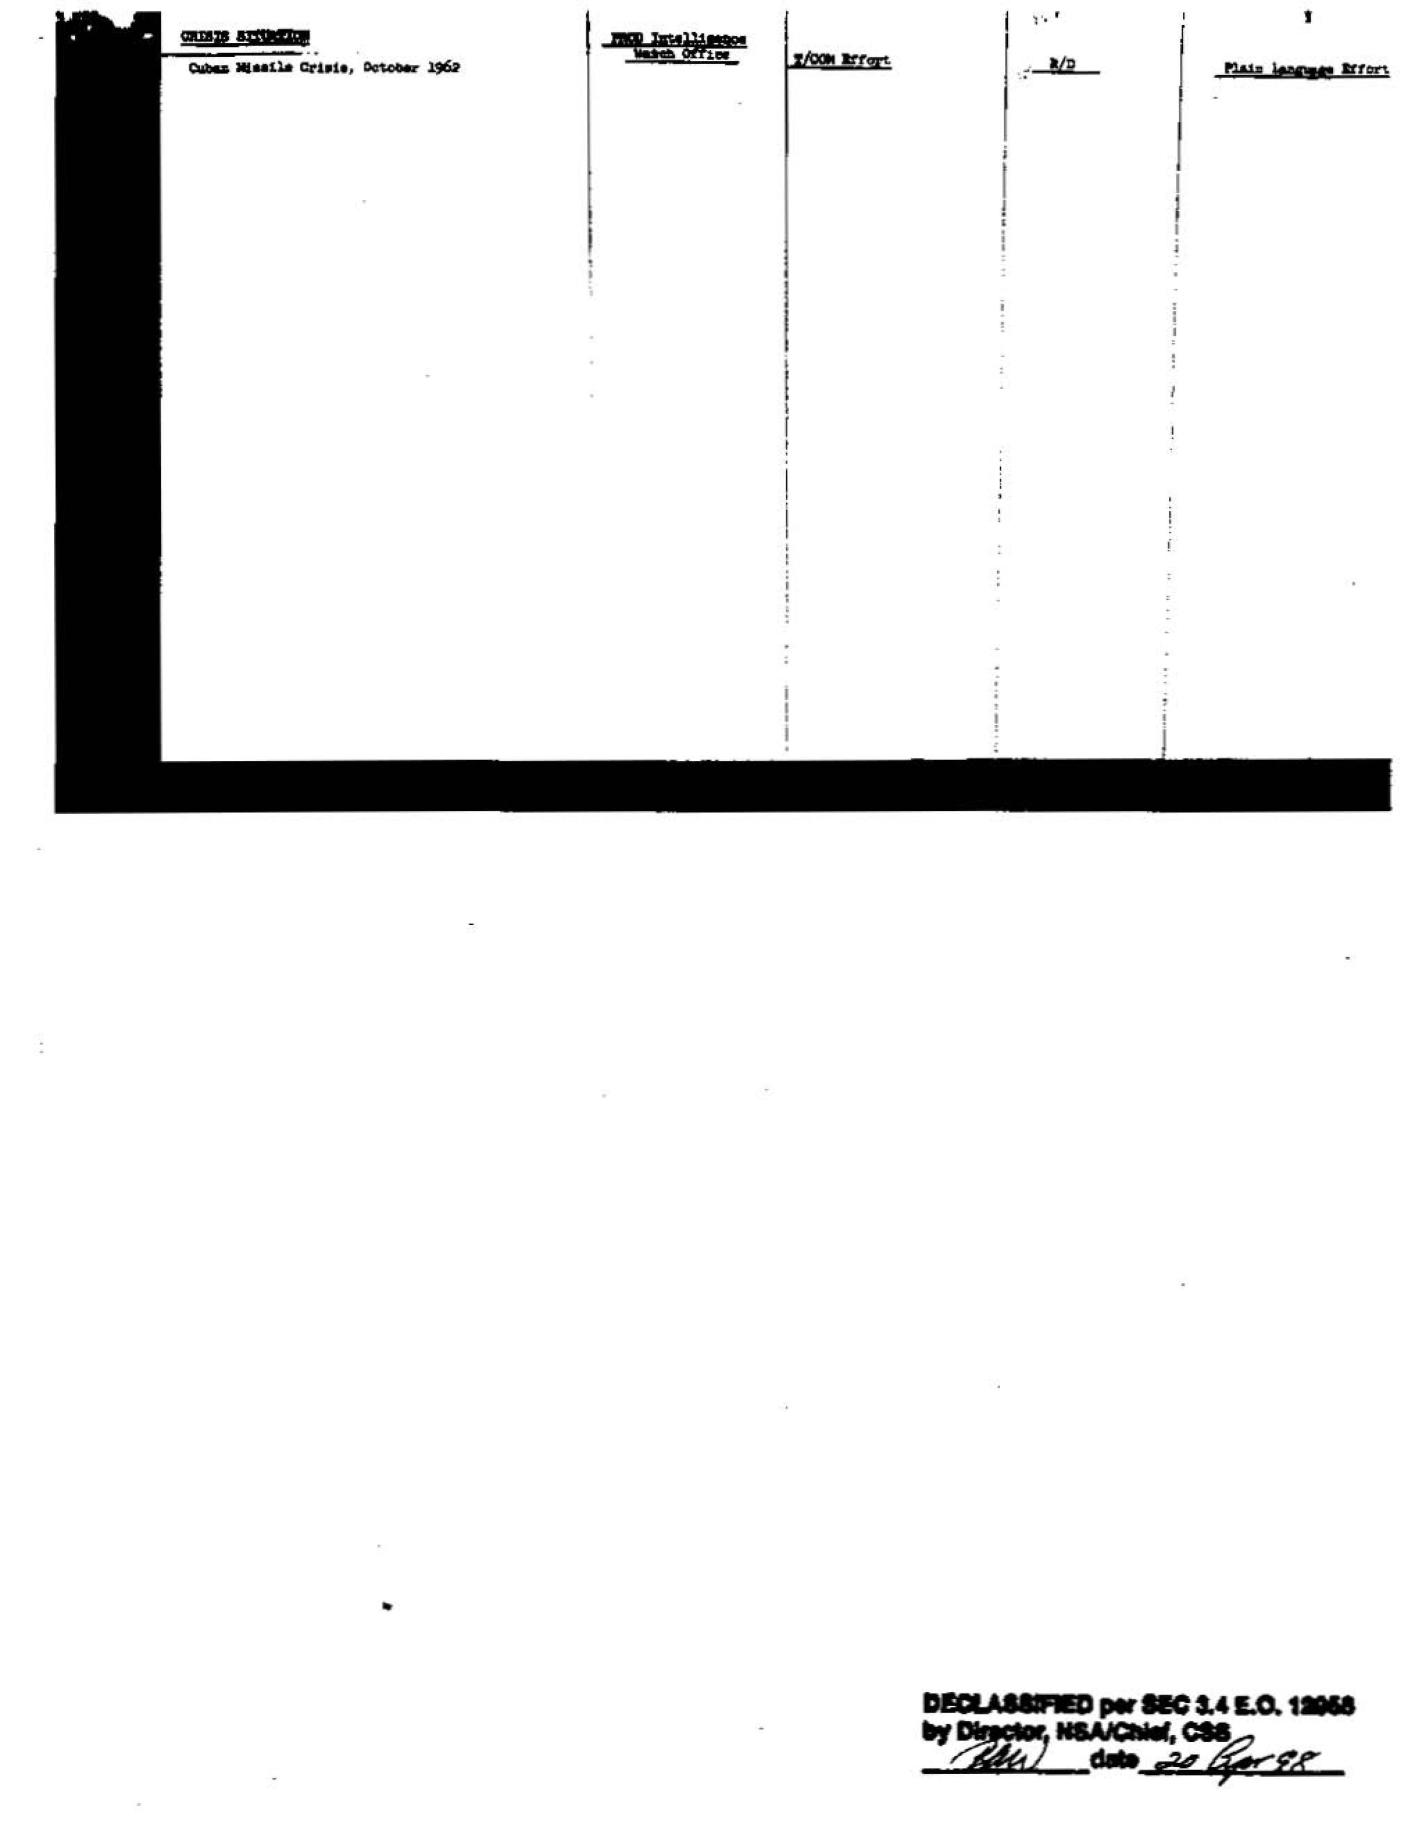 OCTOBER_BLANK_SAMPLE.PDF